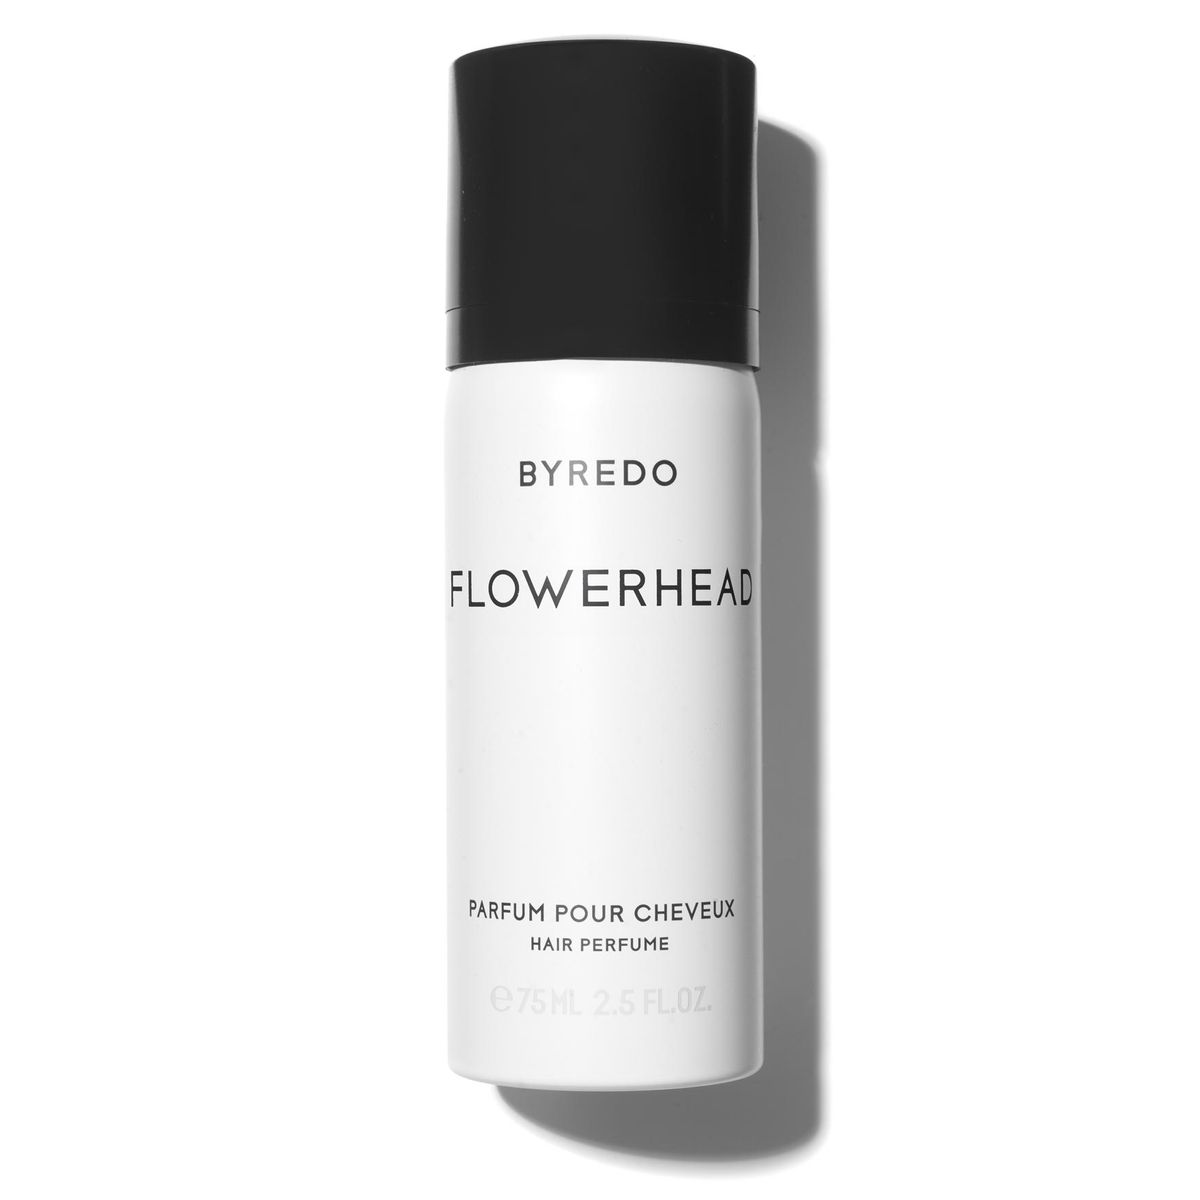 Flowerhead Hair Perfume